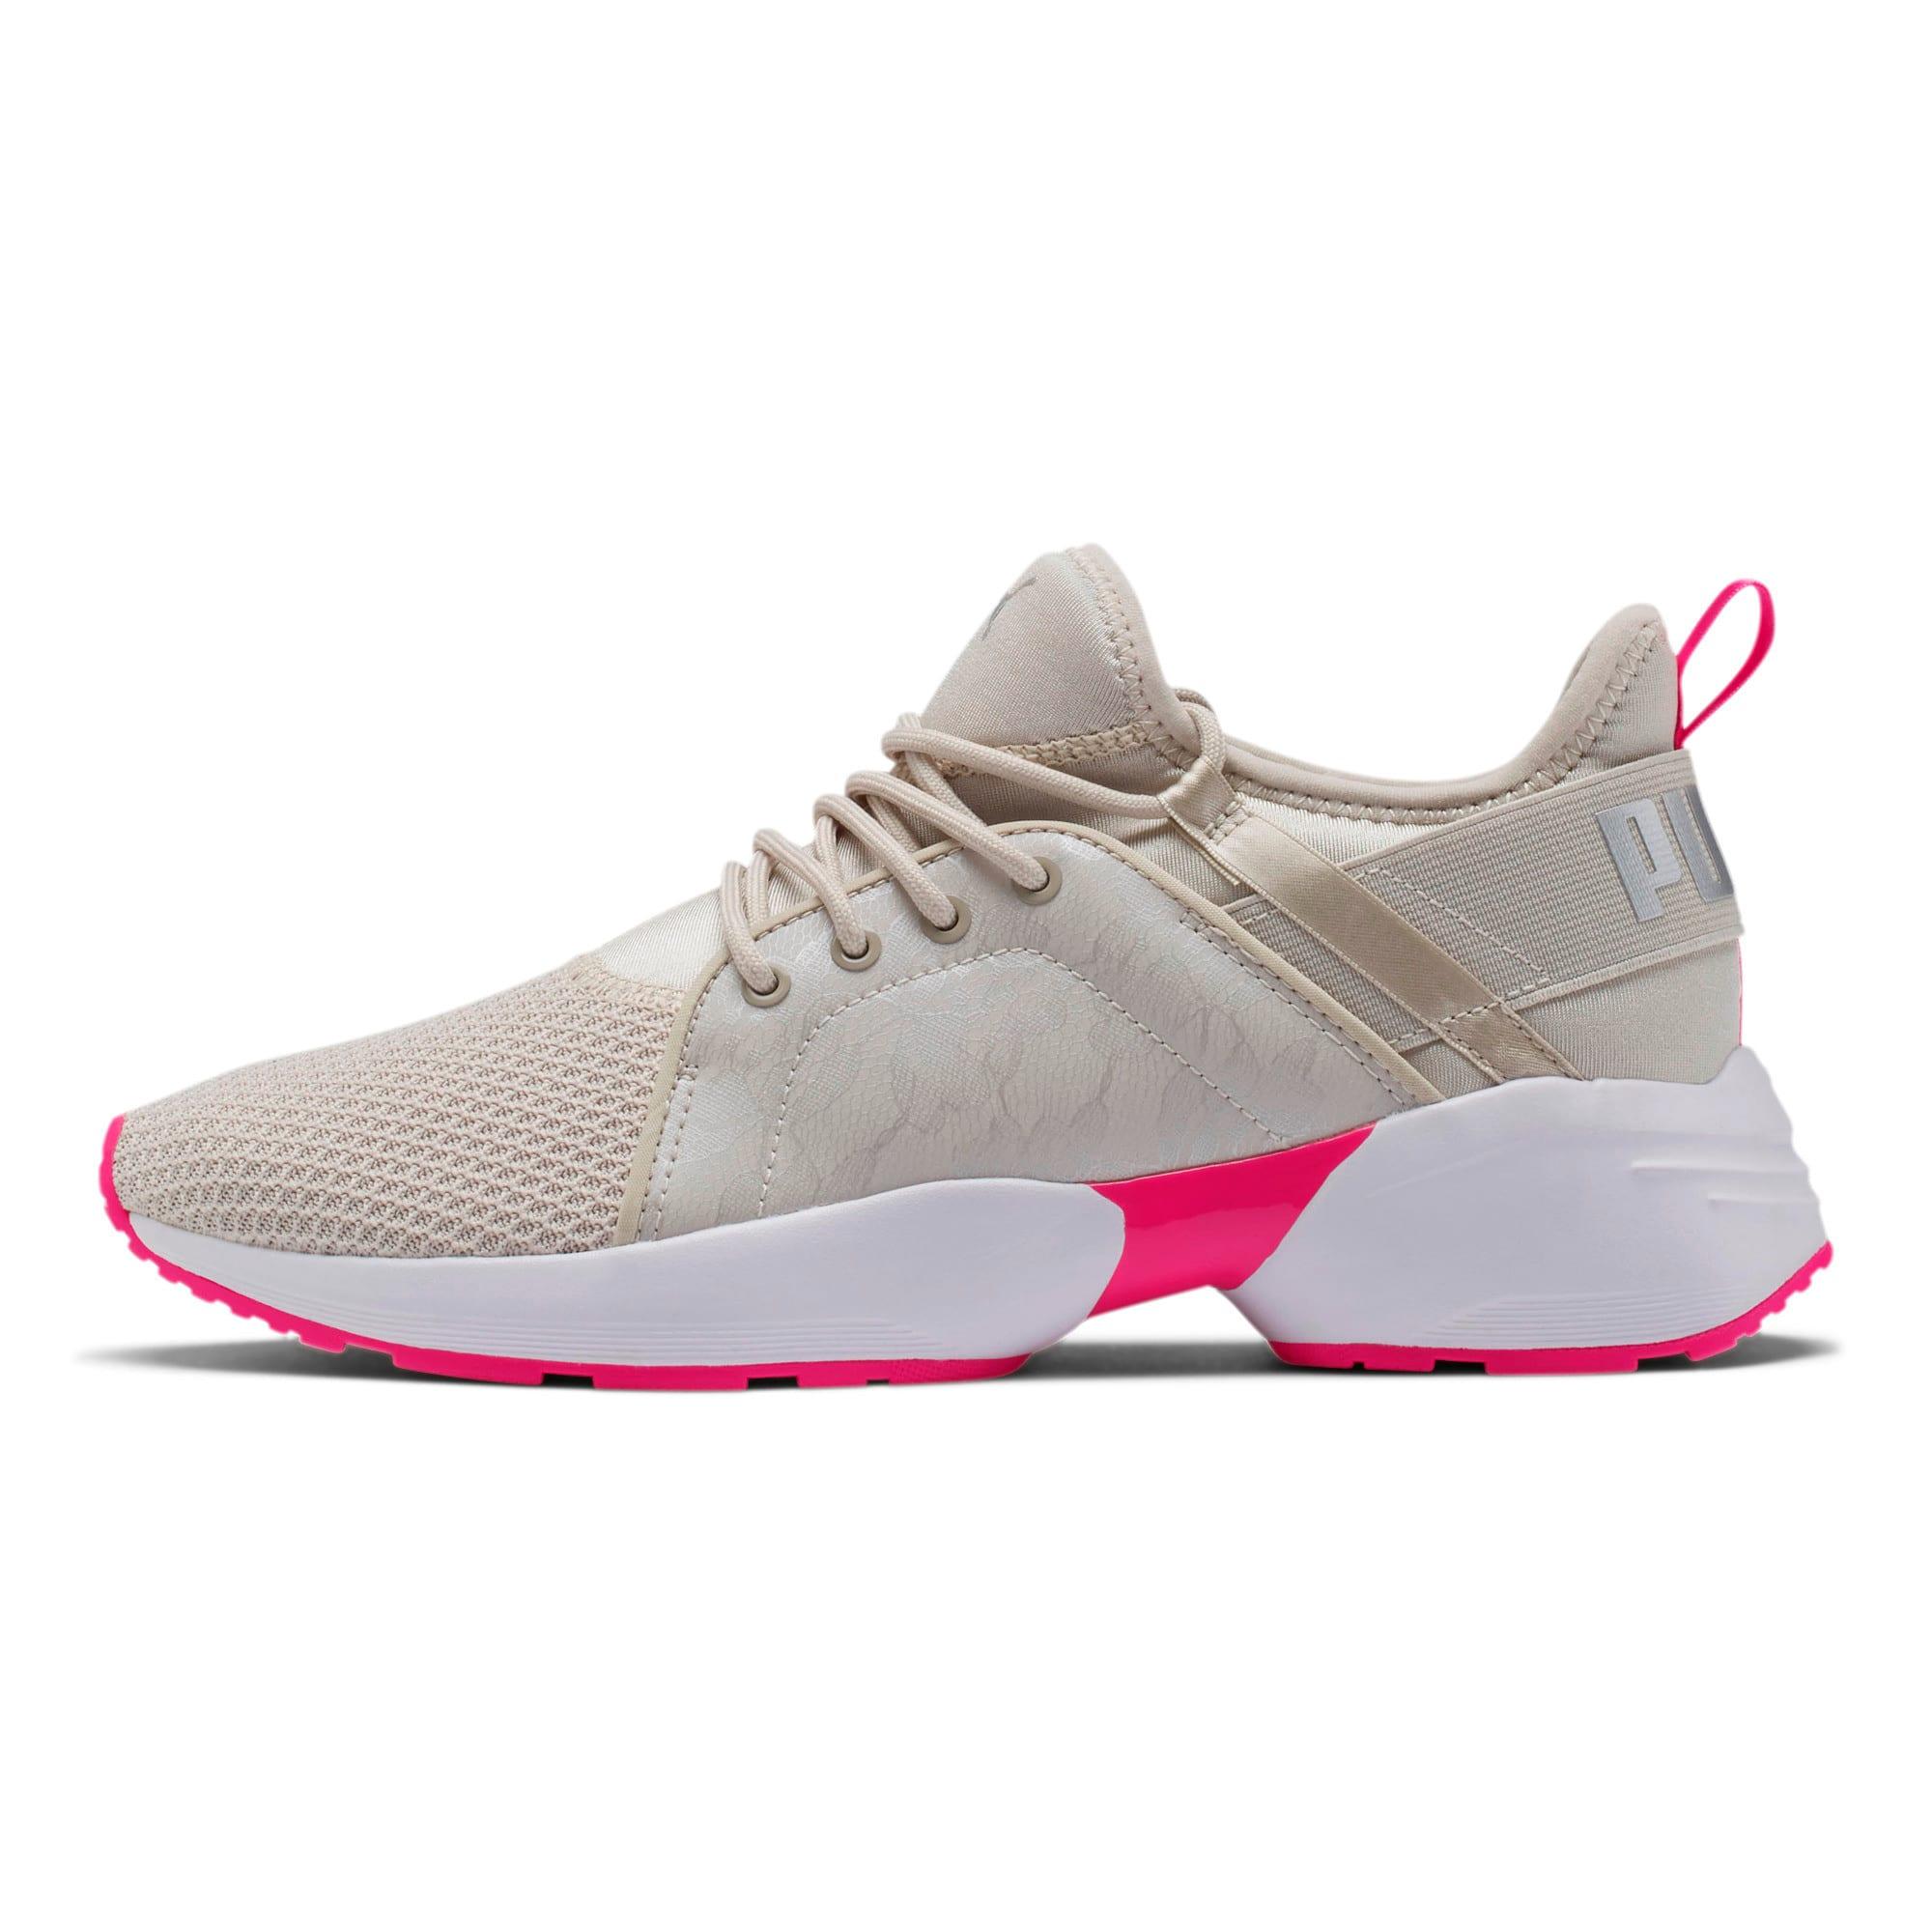 Thumbnail 1 of Sirena Summer Women's Sneakers, Silver Gray-Puma White, medium